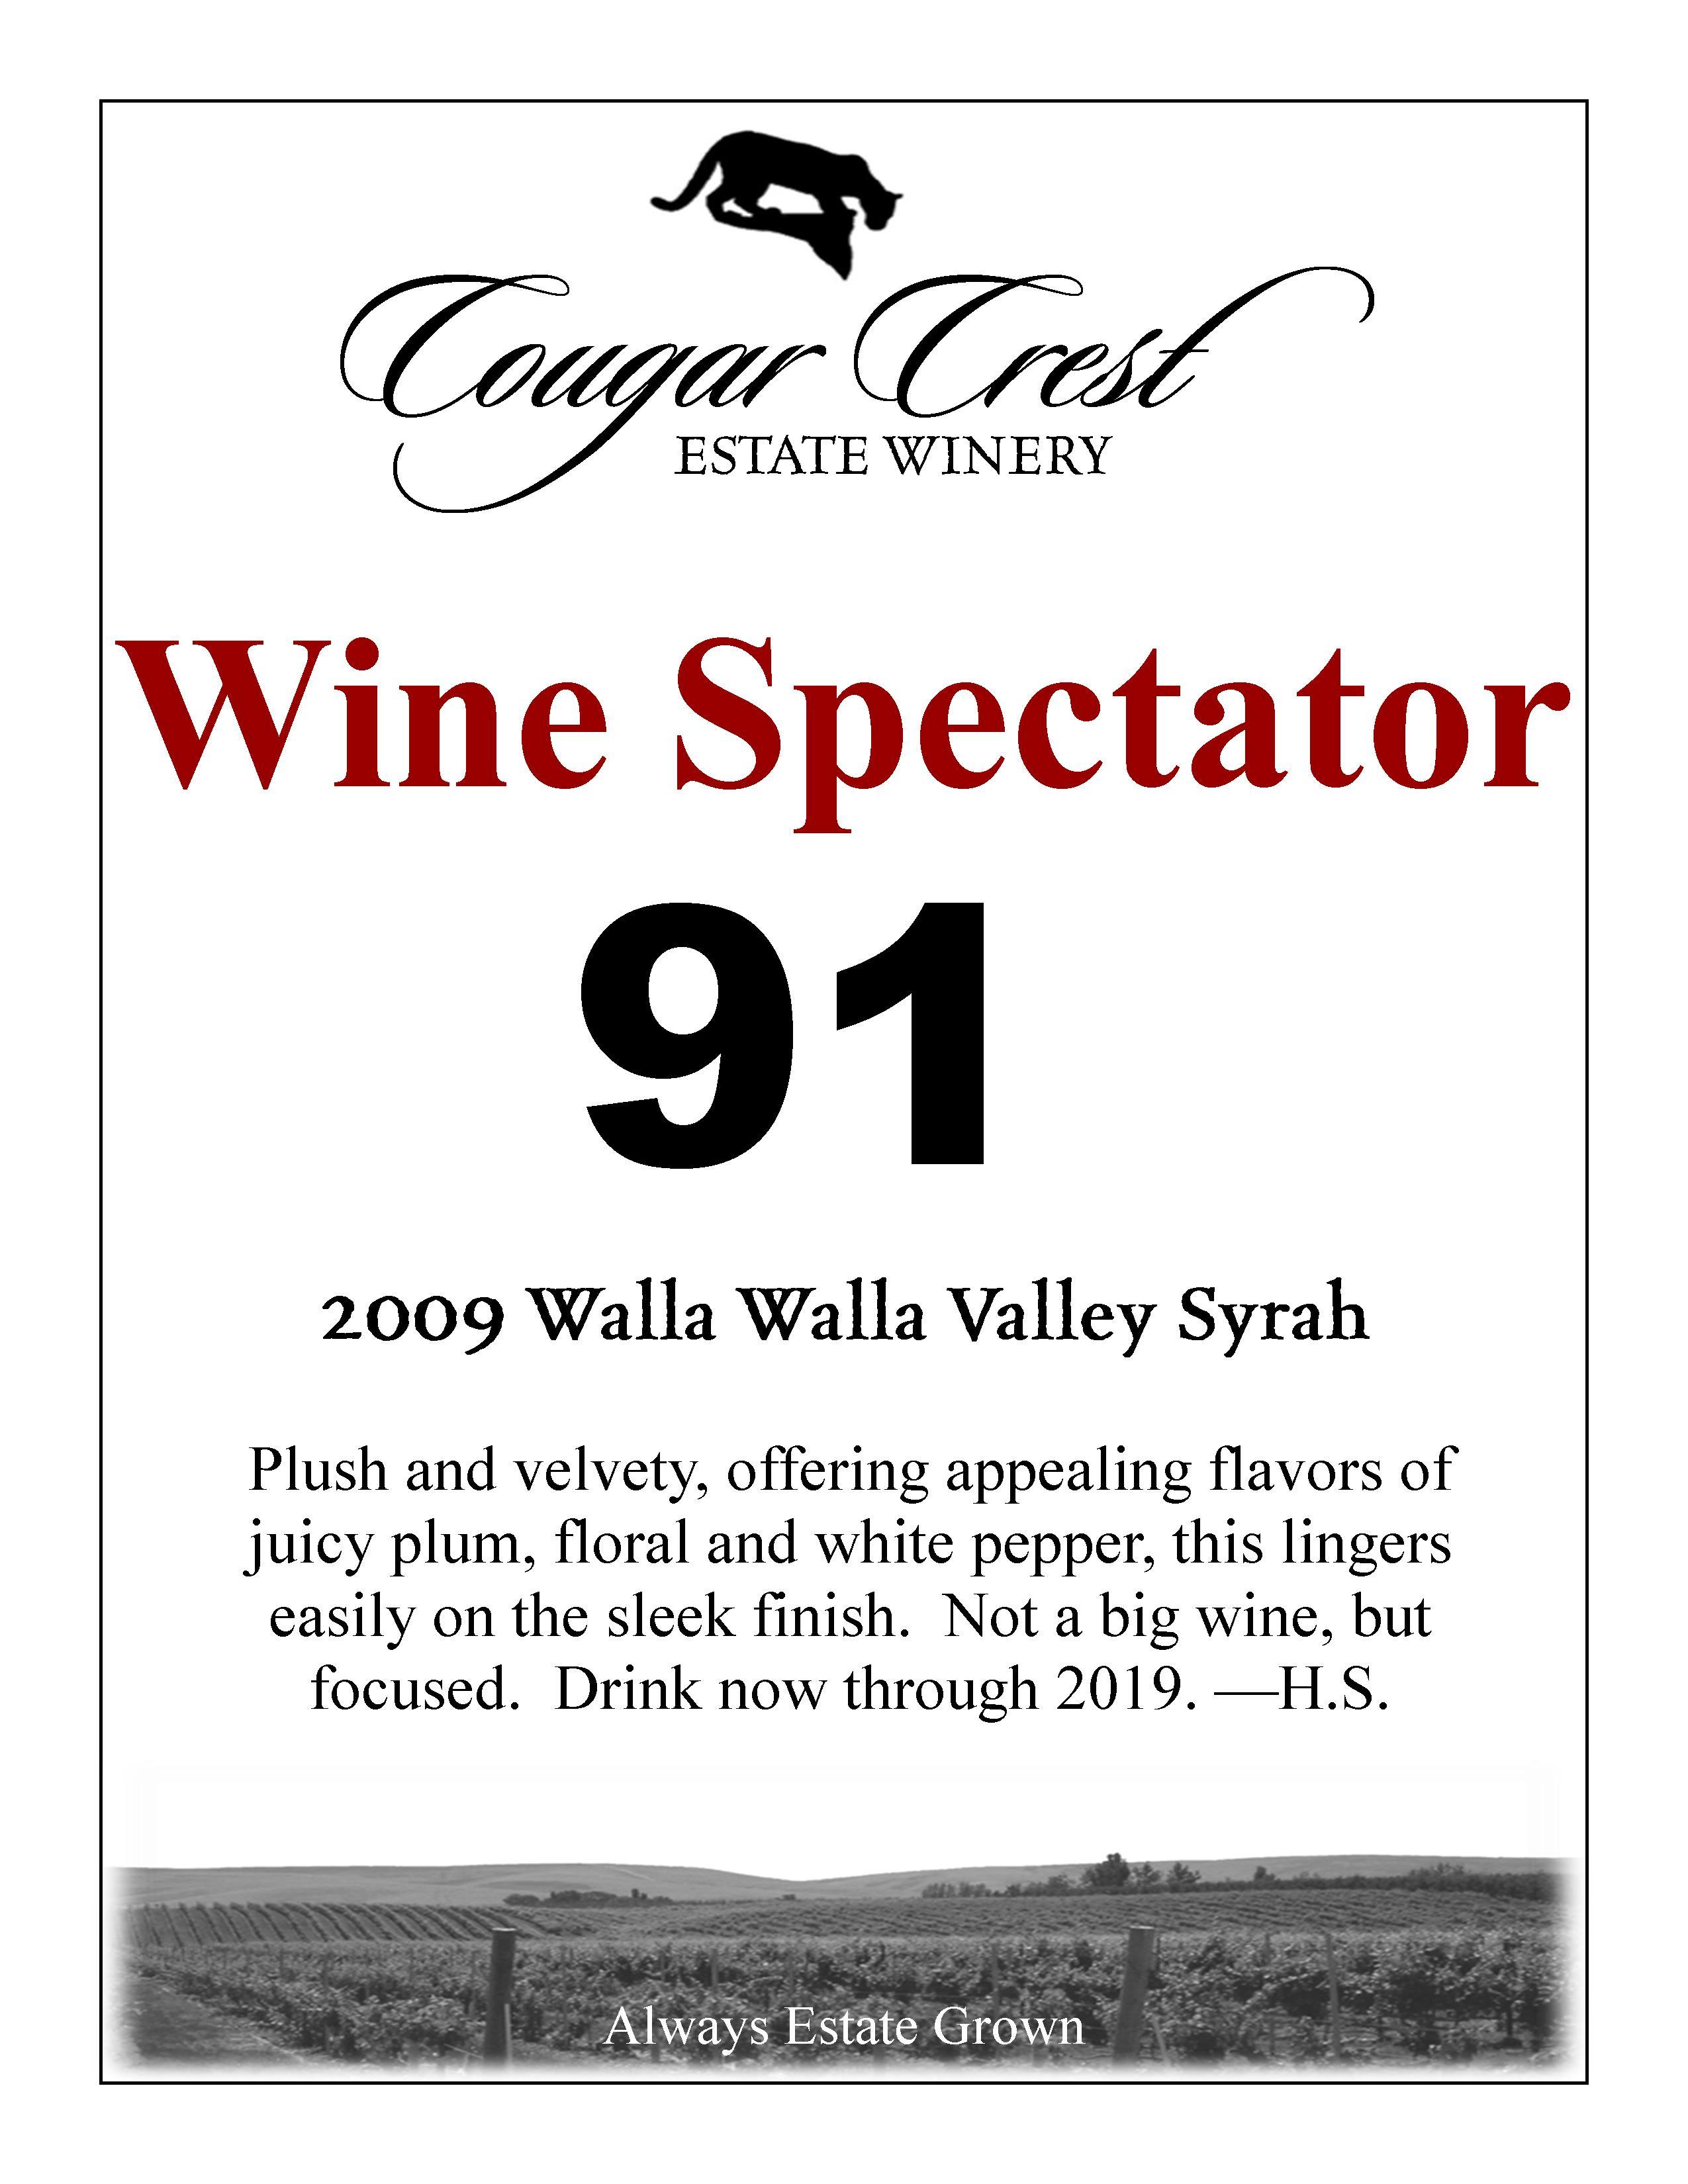 2009 Syrah Wine Spectator